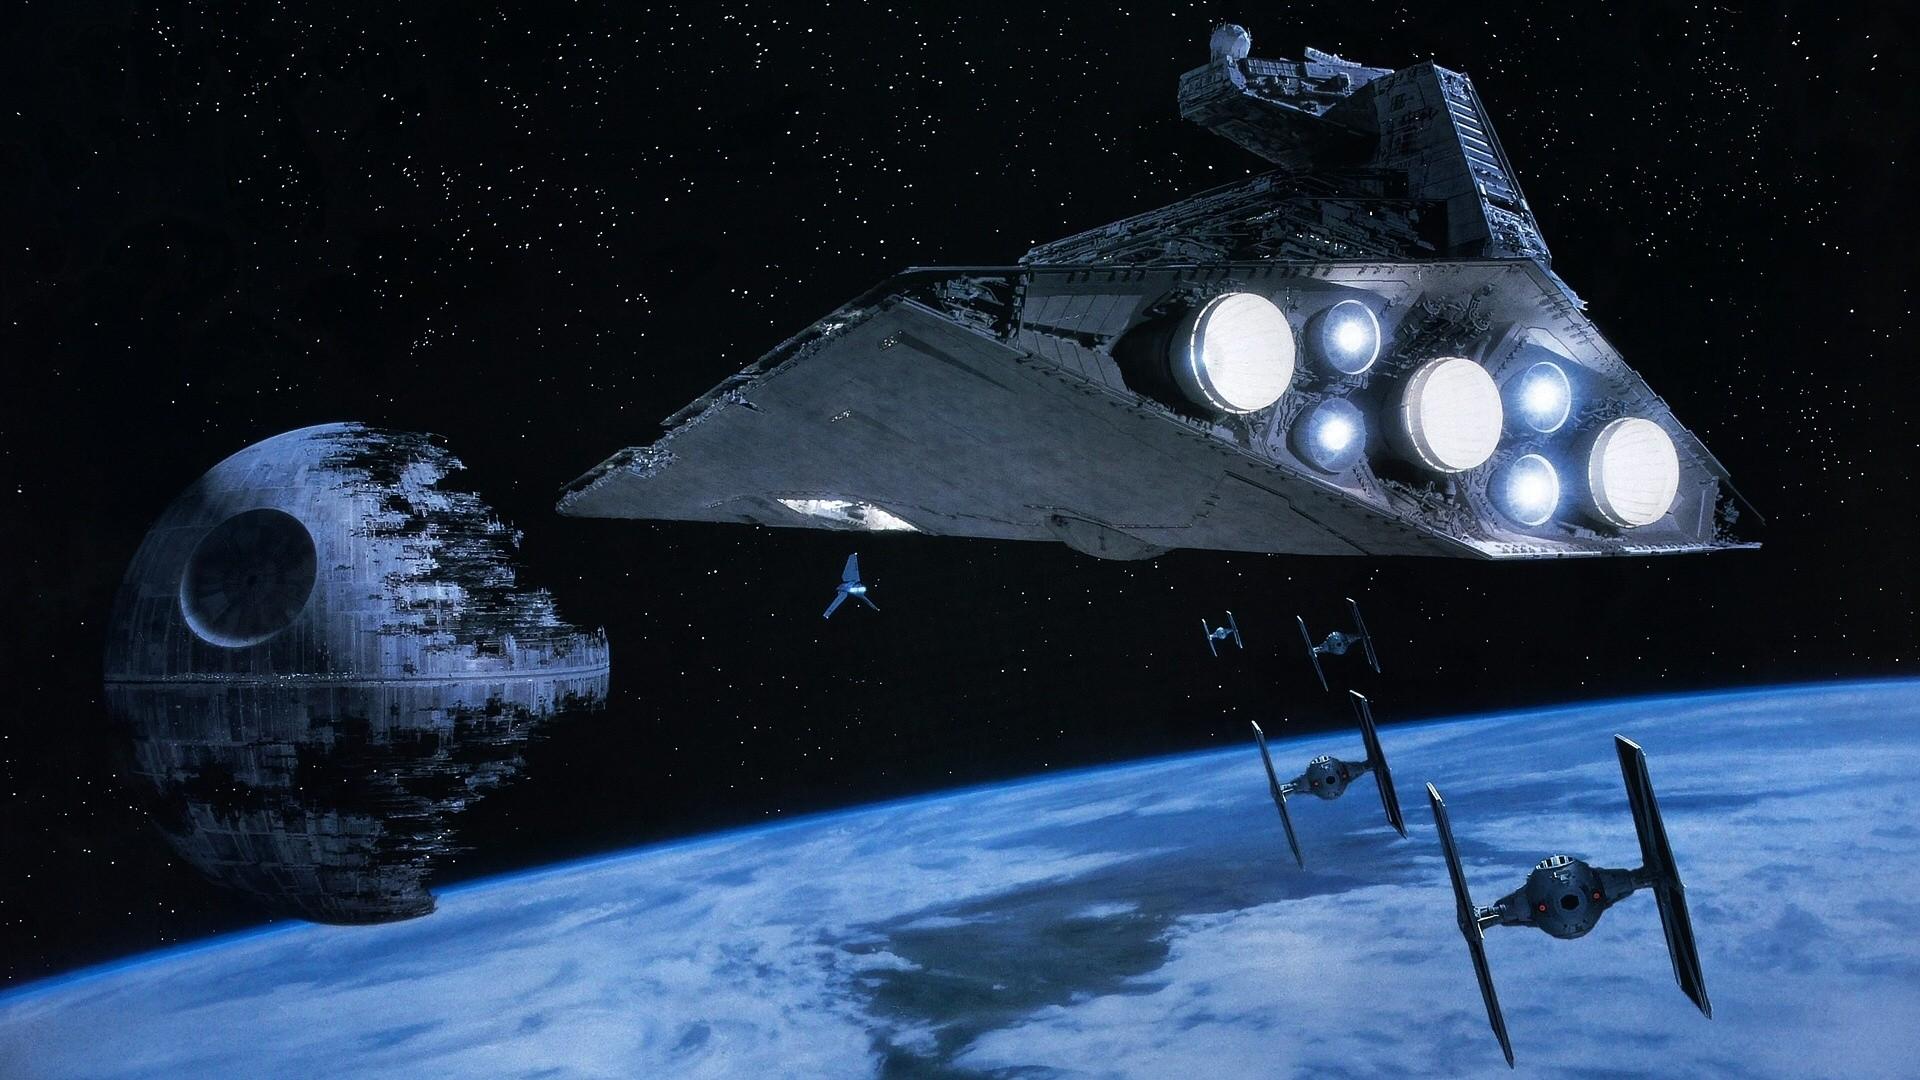 star wars wallpaper hd 1080p (71+ images)